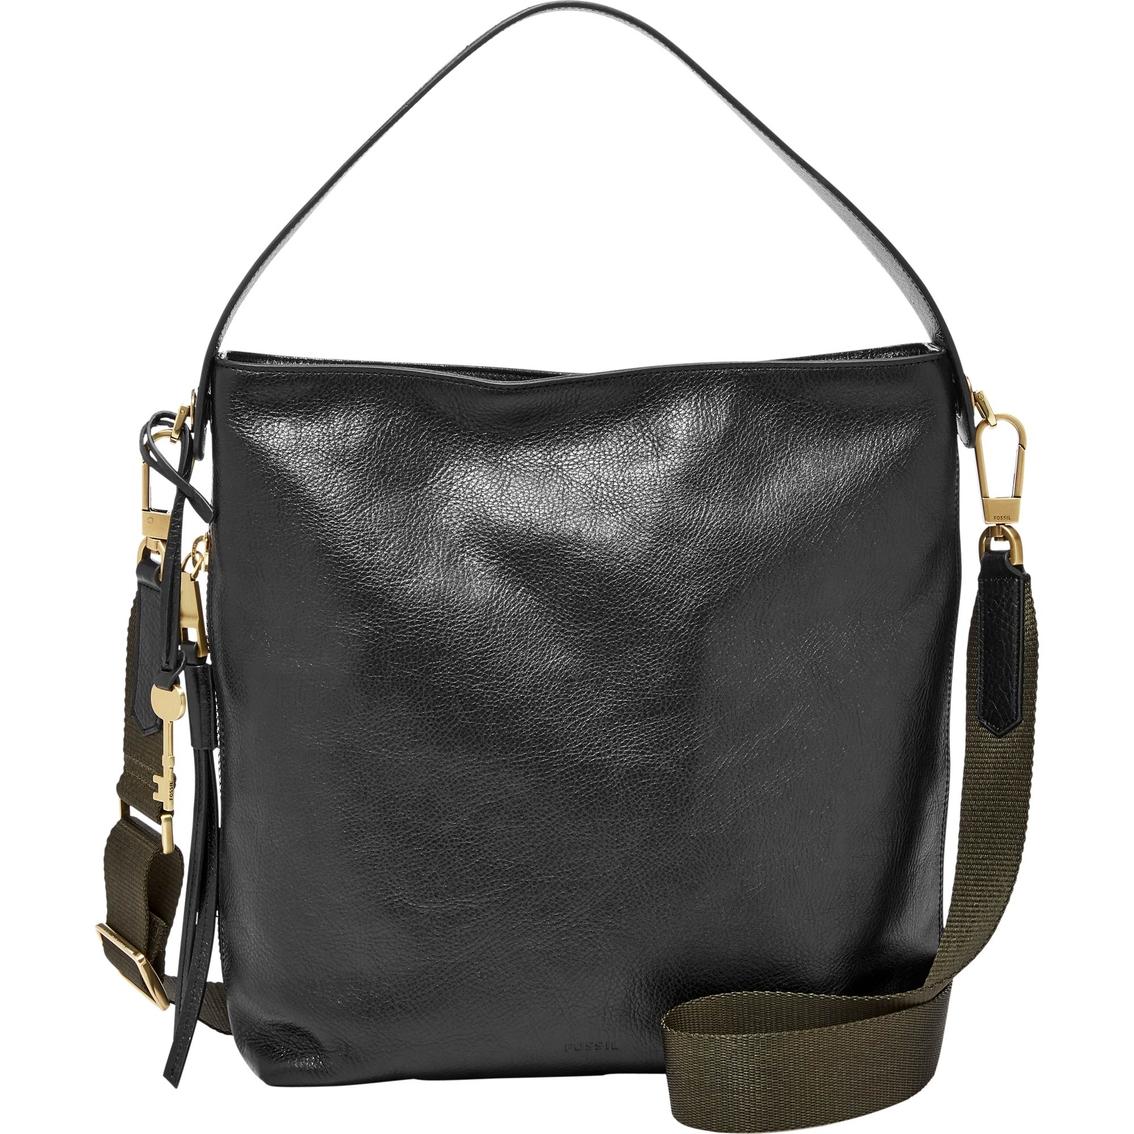 6a99bbe44 Fossil Maya Small Hobo Handbag | Hobo Bags | Handbags & Accessories ...